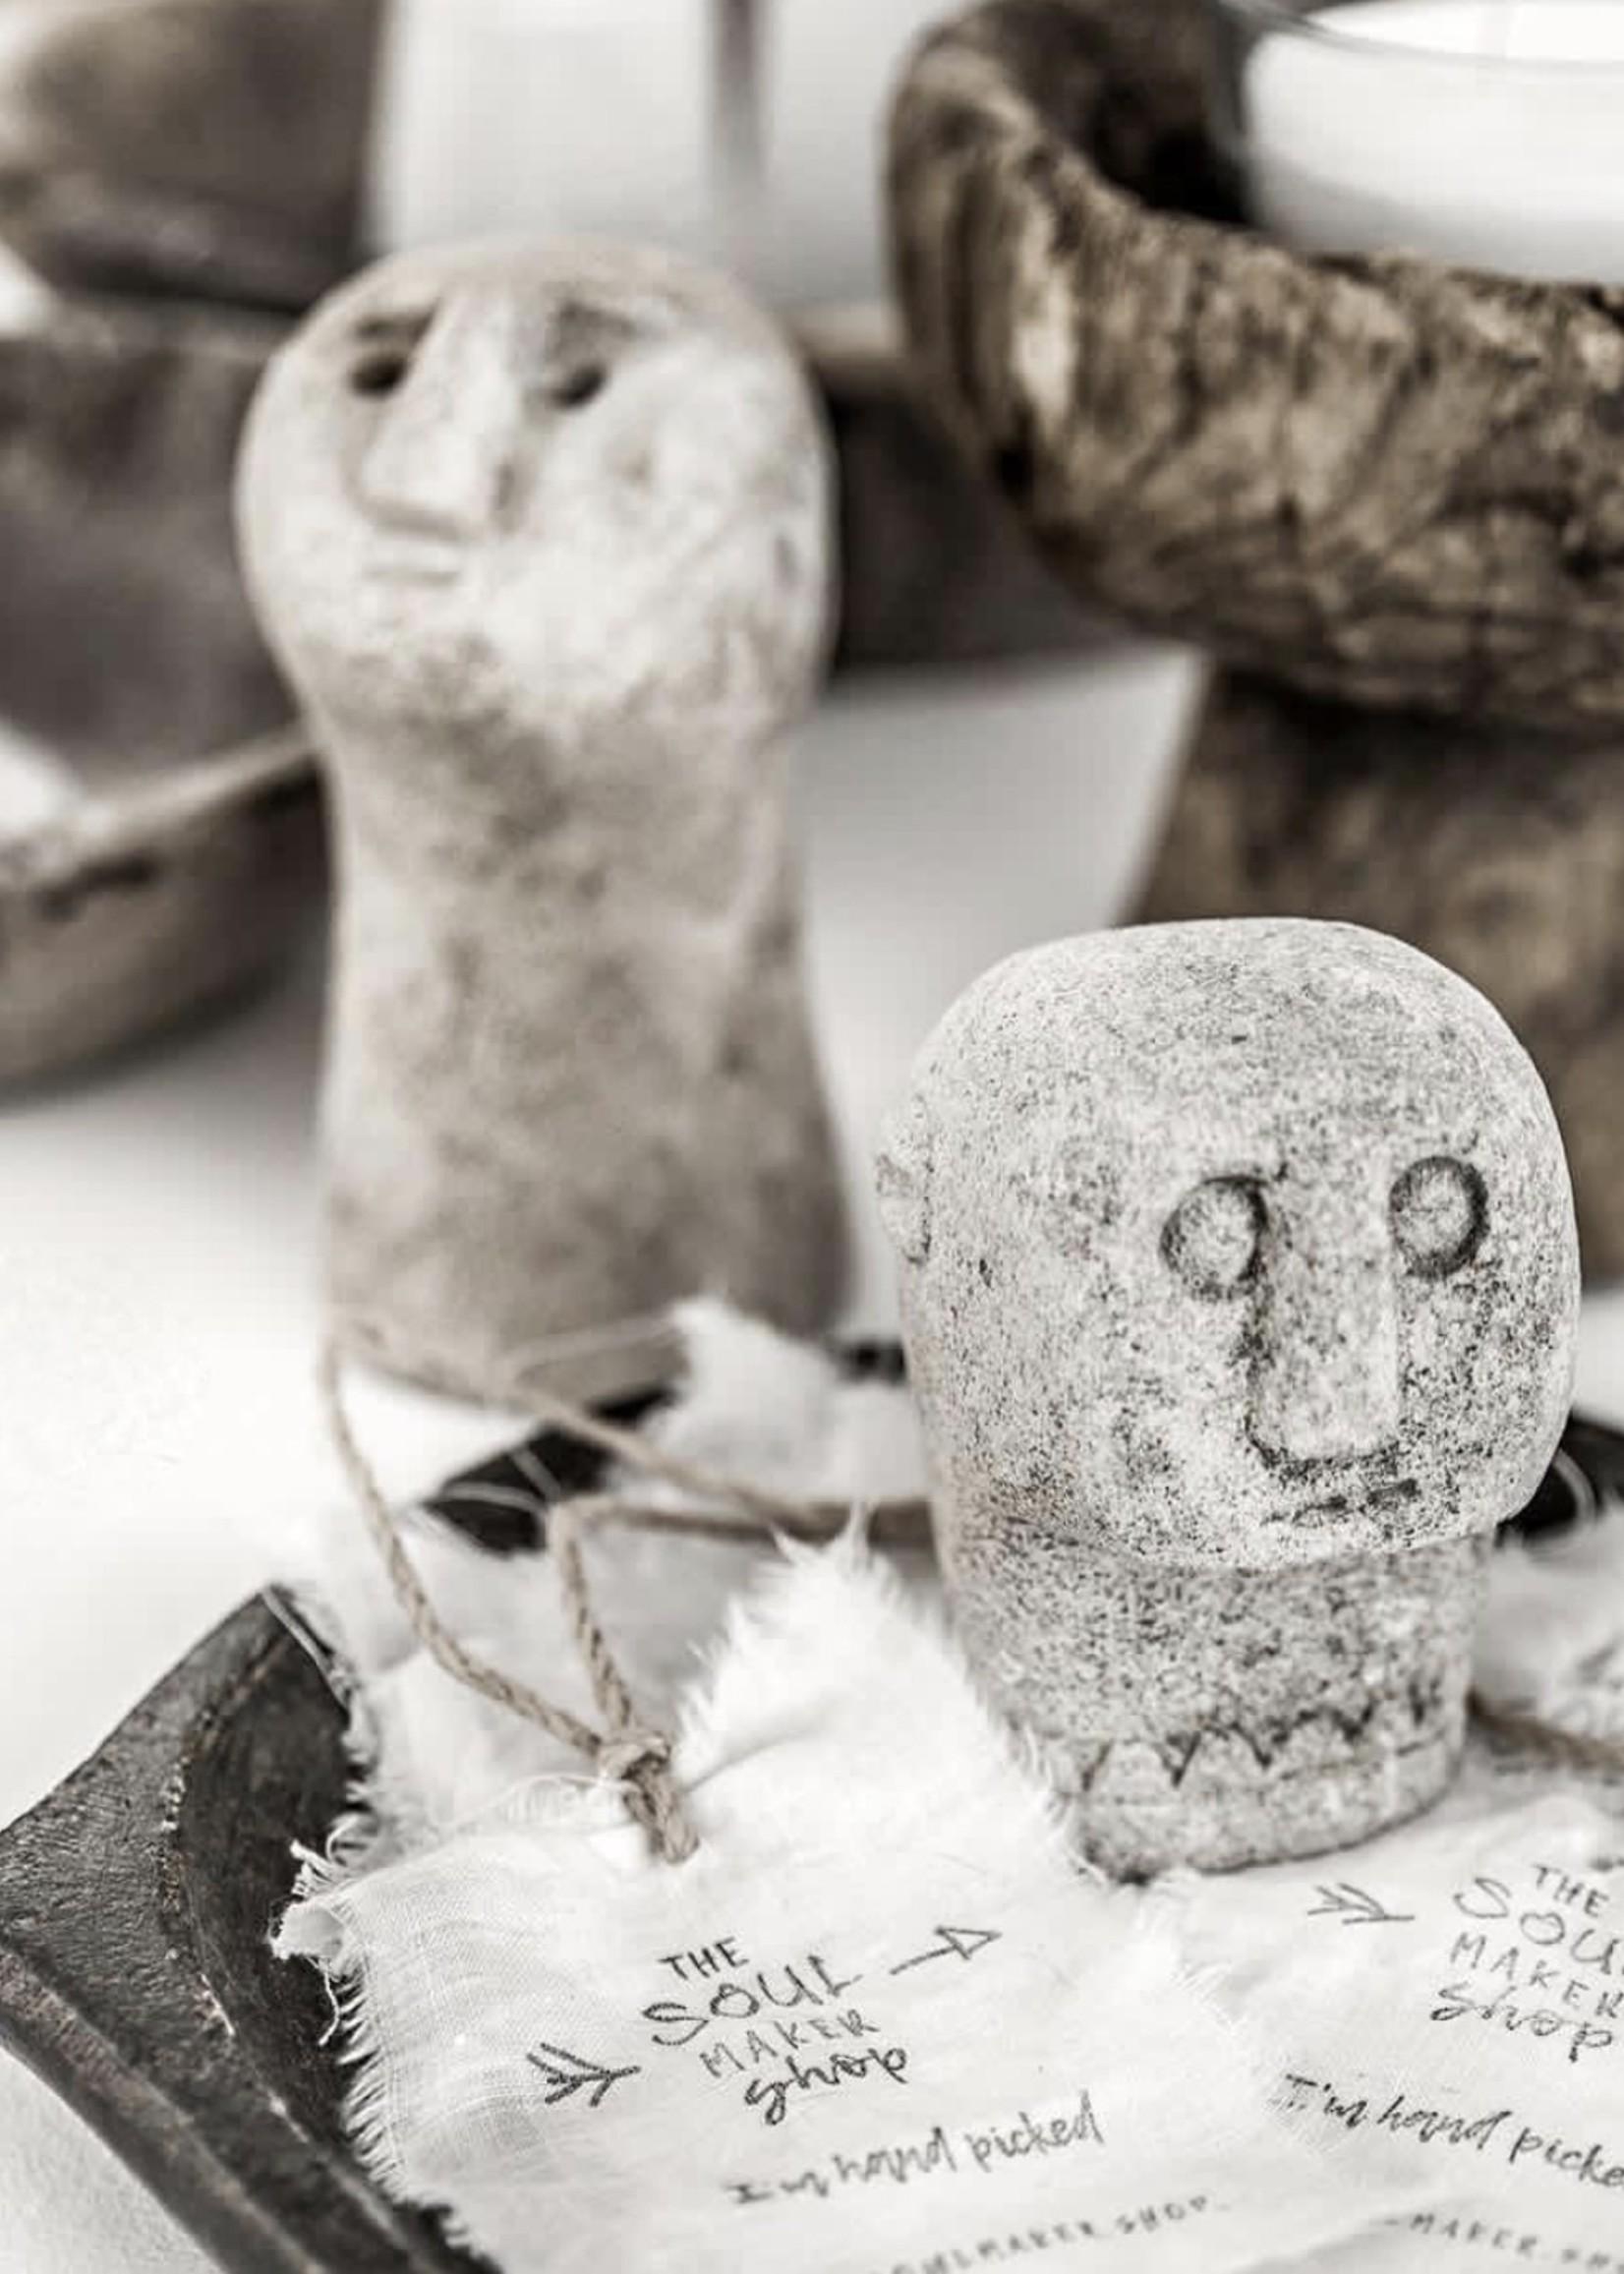 Sumba Stone Statue #08 - Natural